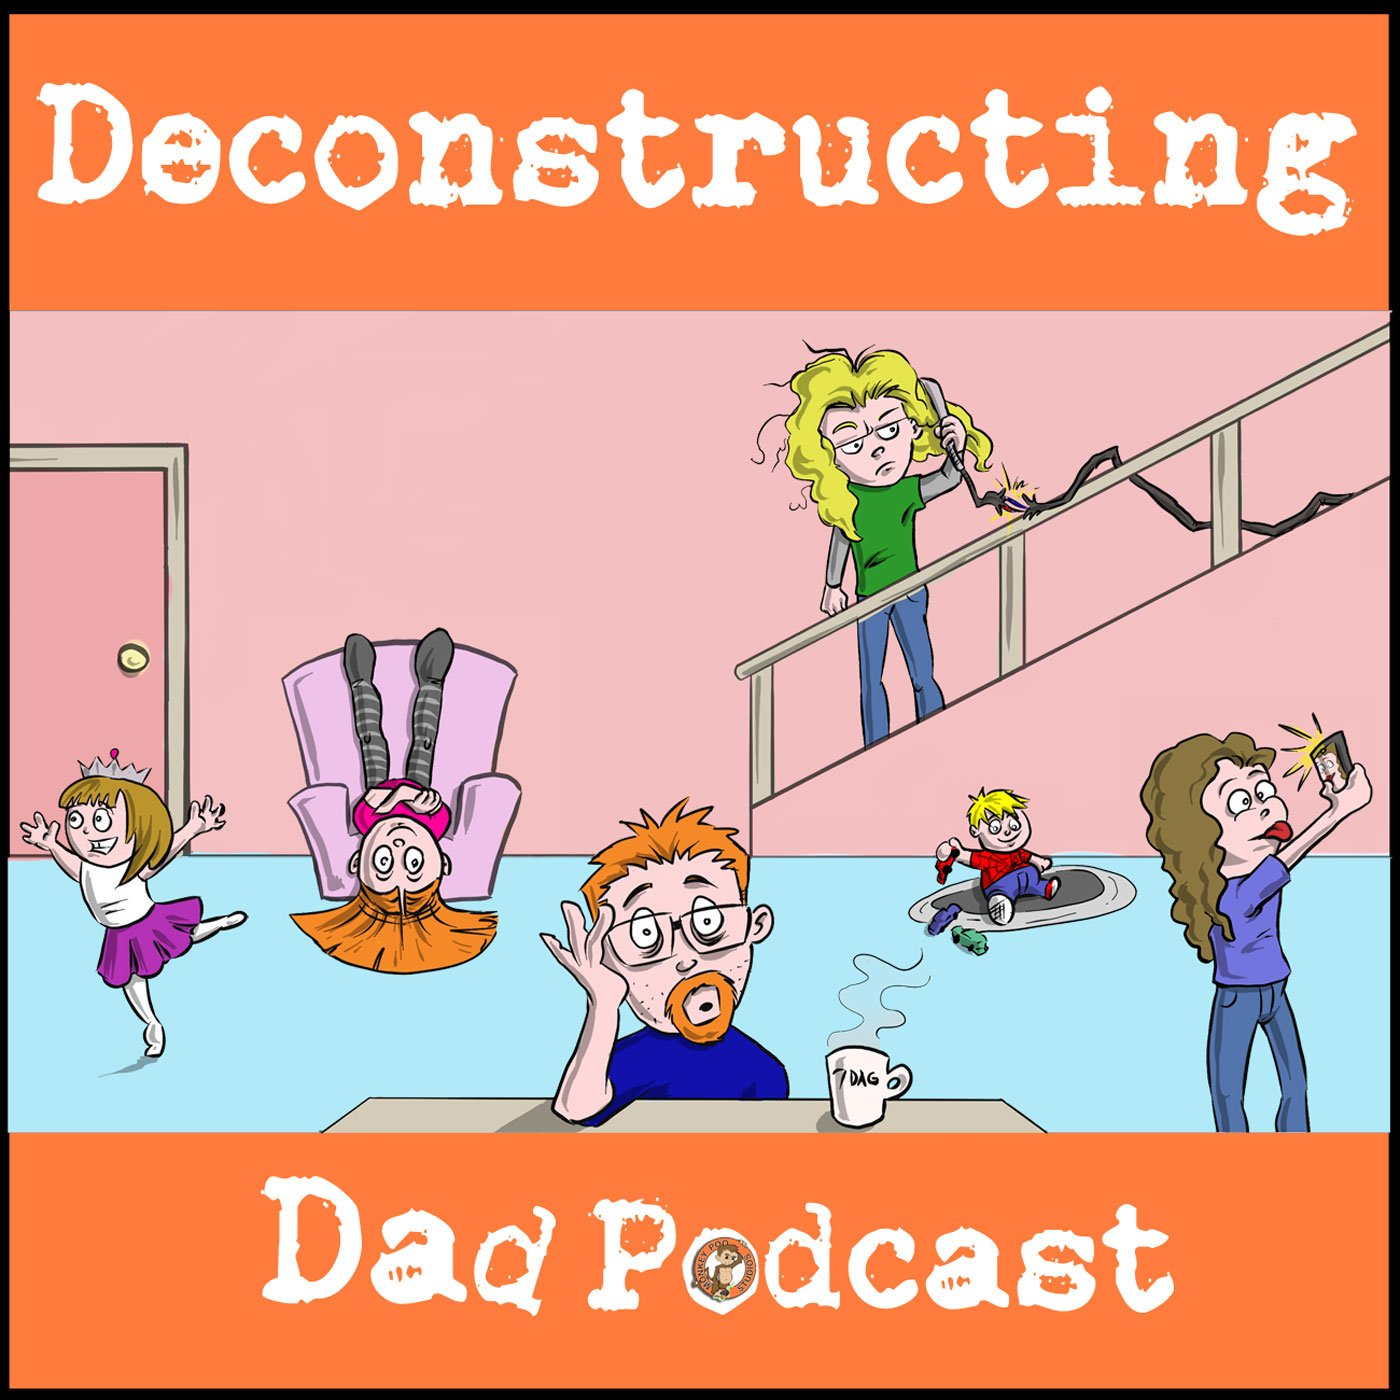 Deconstructing Dad Podcast show art